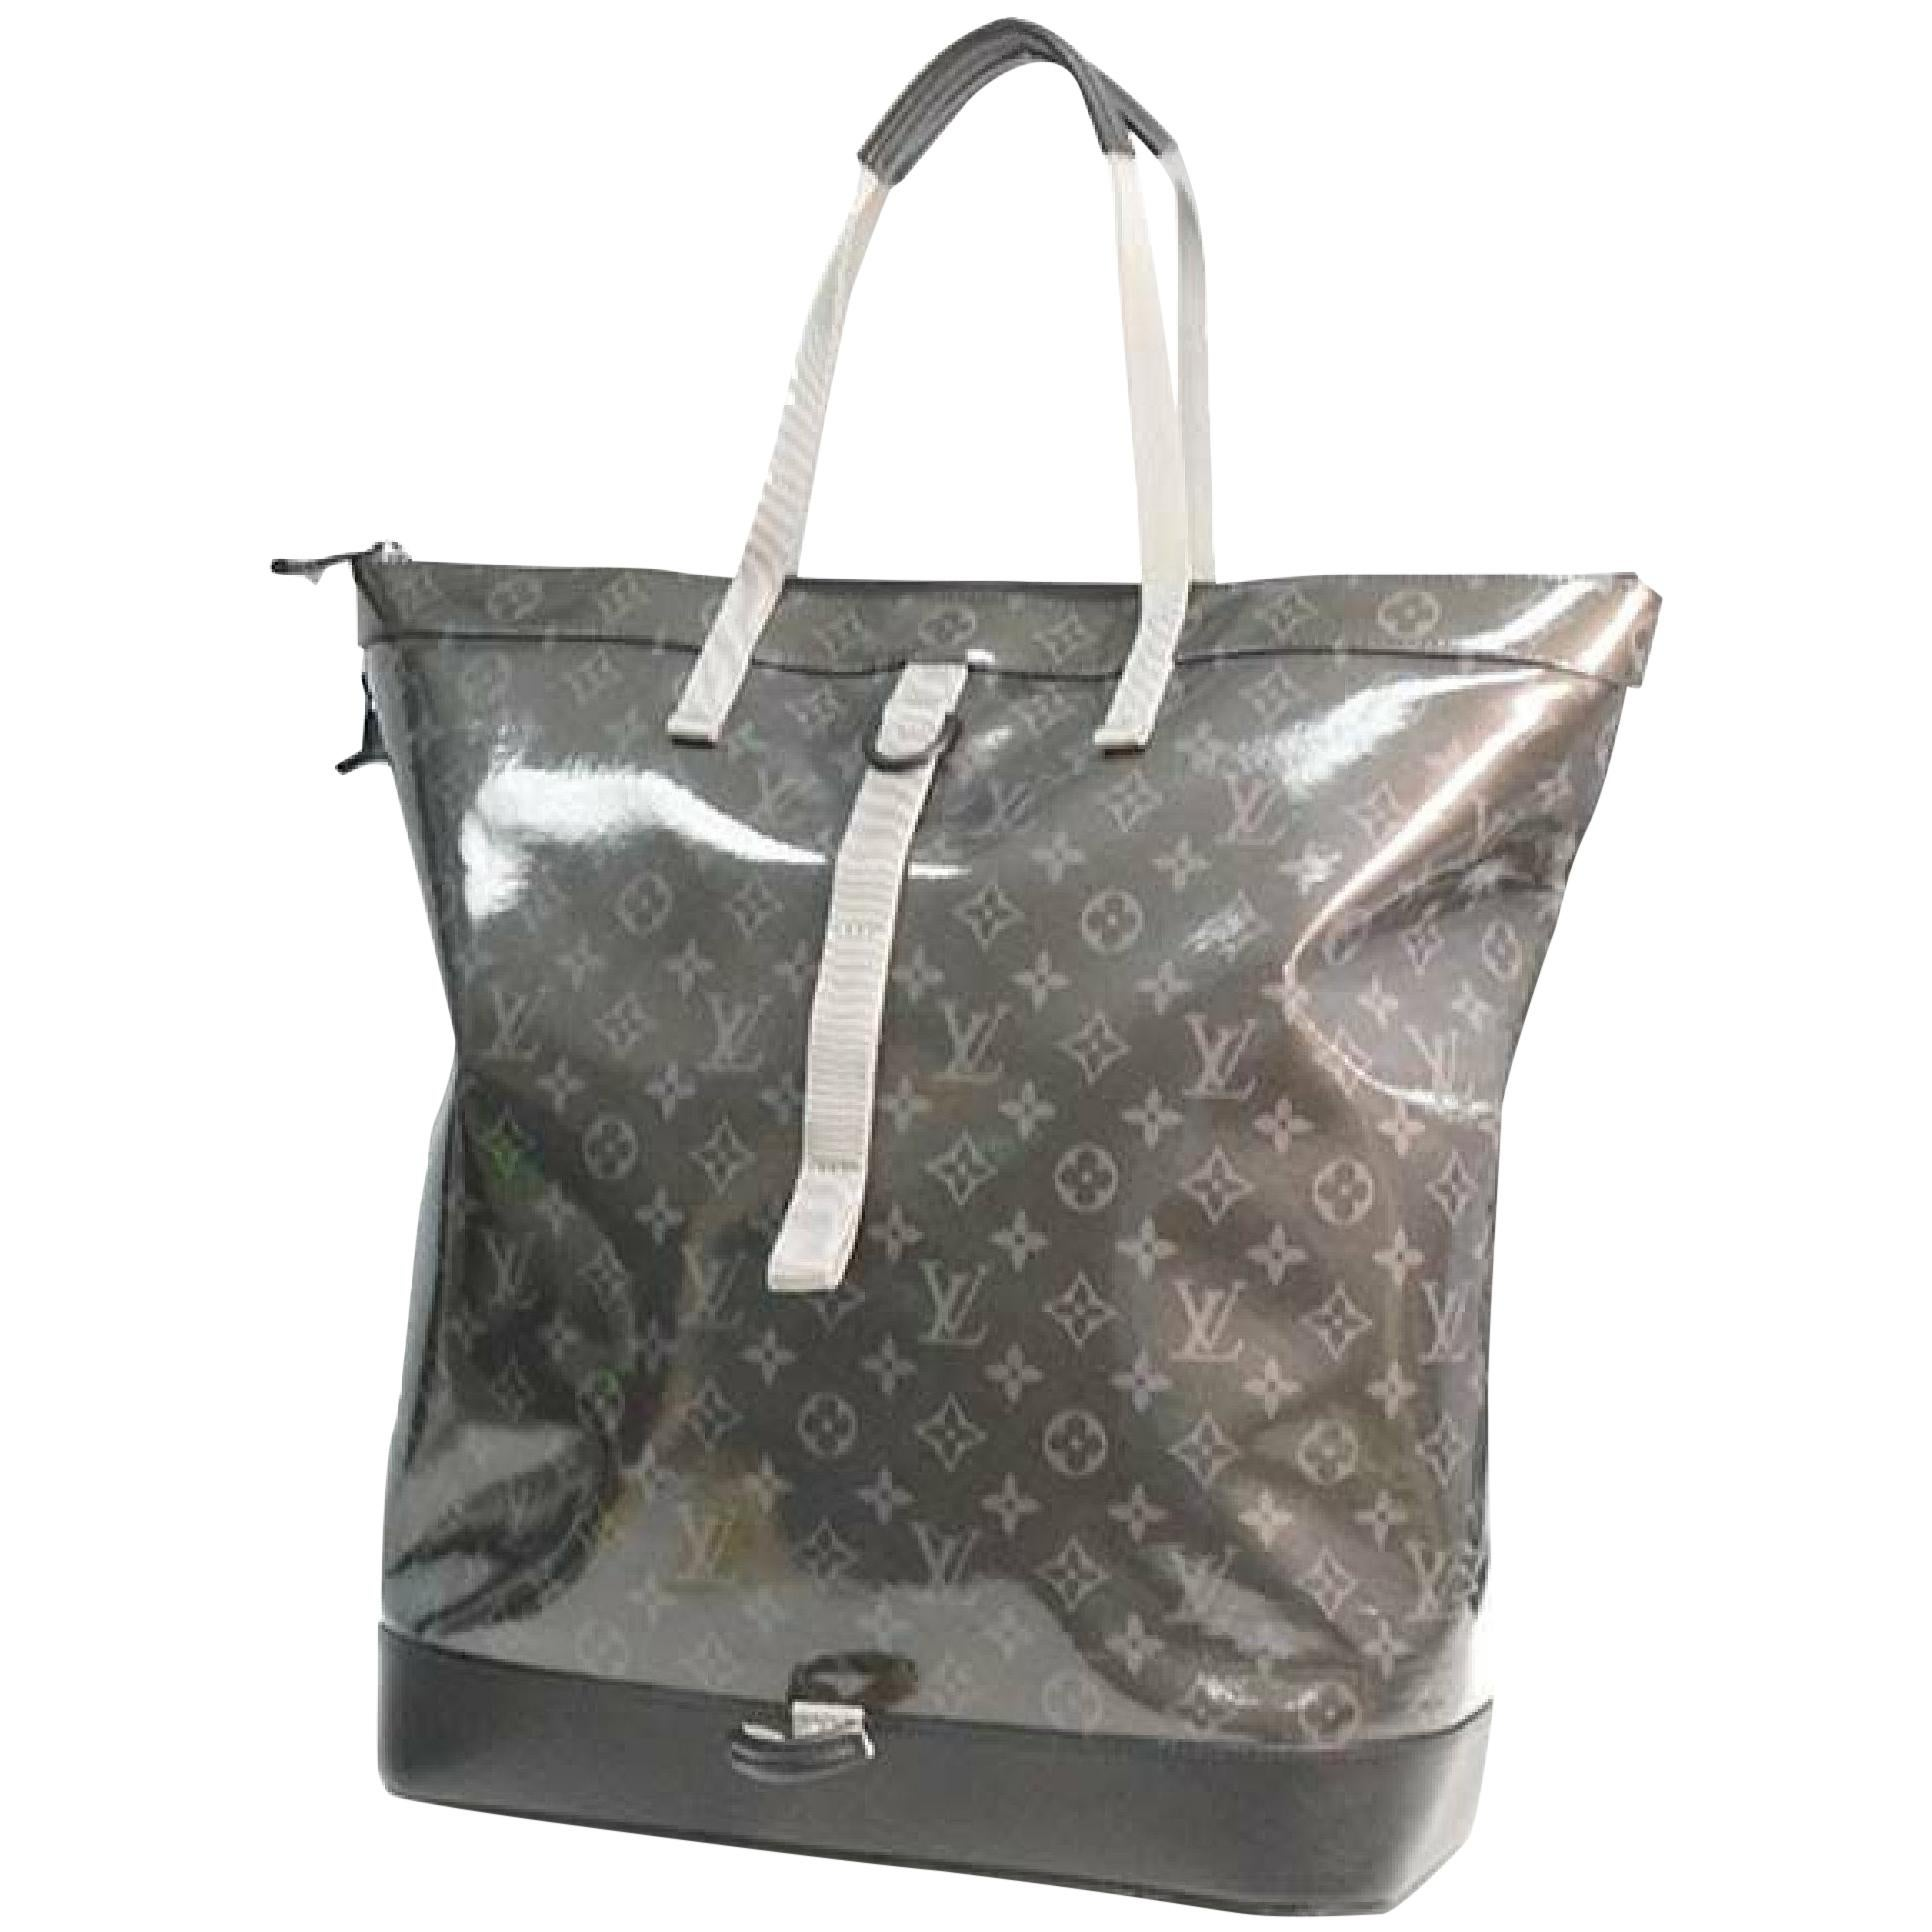 LOUIS VUITTON Glaze Zipped tote ruck sack Mens tote bag M43900